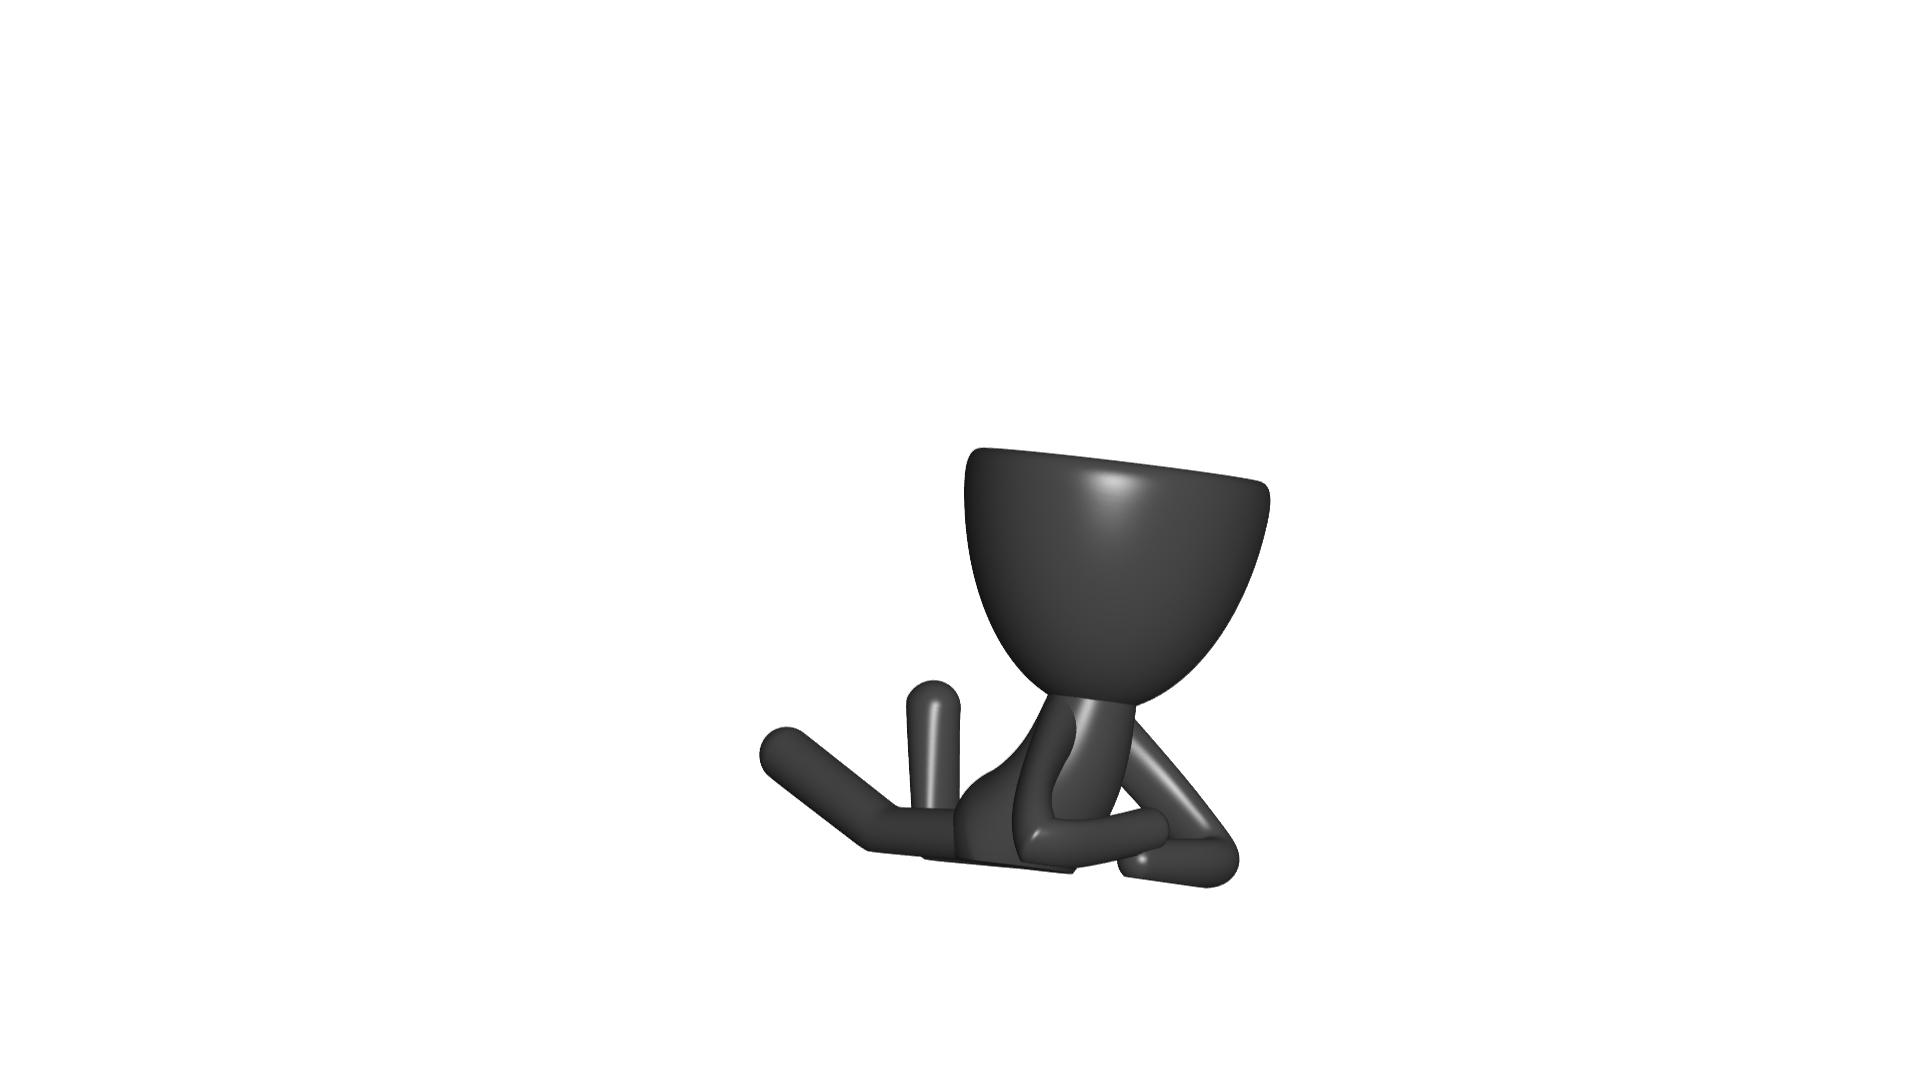 Vaso_02_Negro.jpg Download free STL file JARRÓN MACETA ROBERT 02 - VASE FLOWERPOT ROBERT 02 • 3D print model, PRODUSTL56